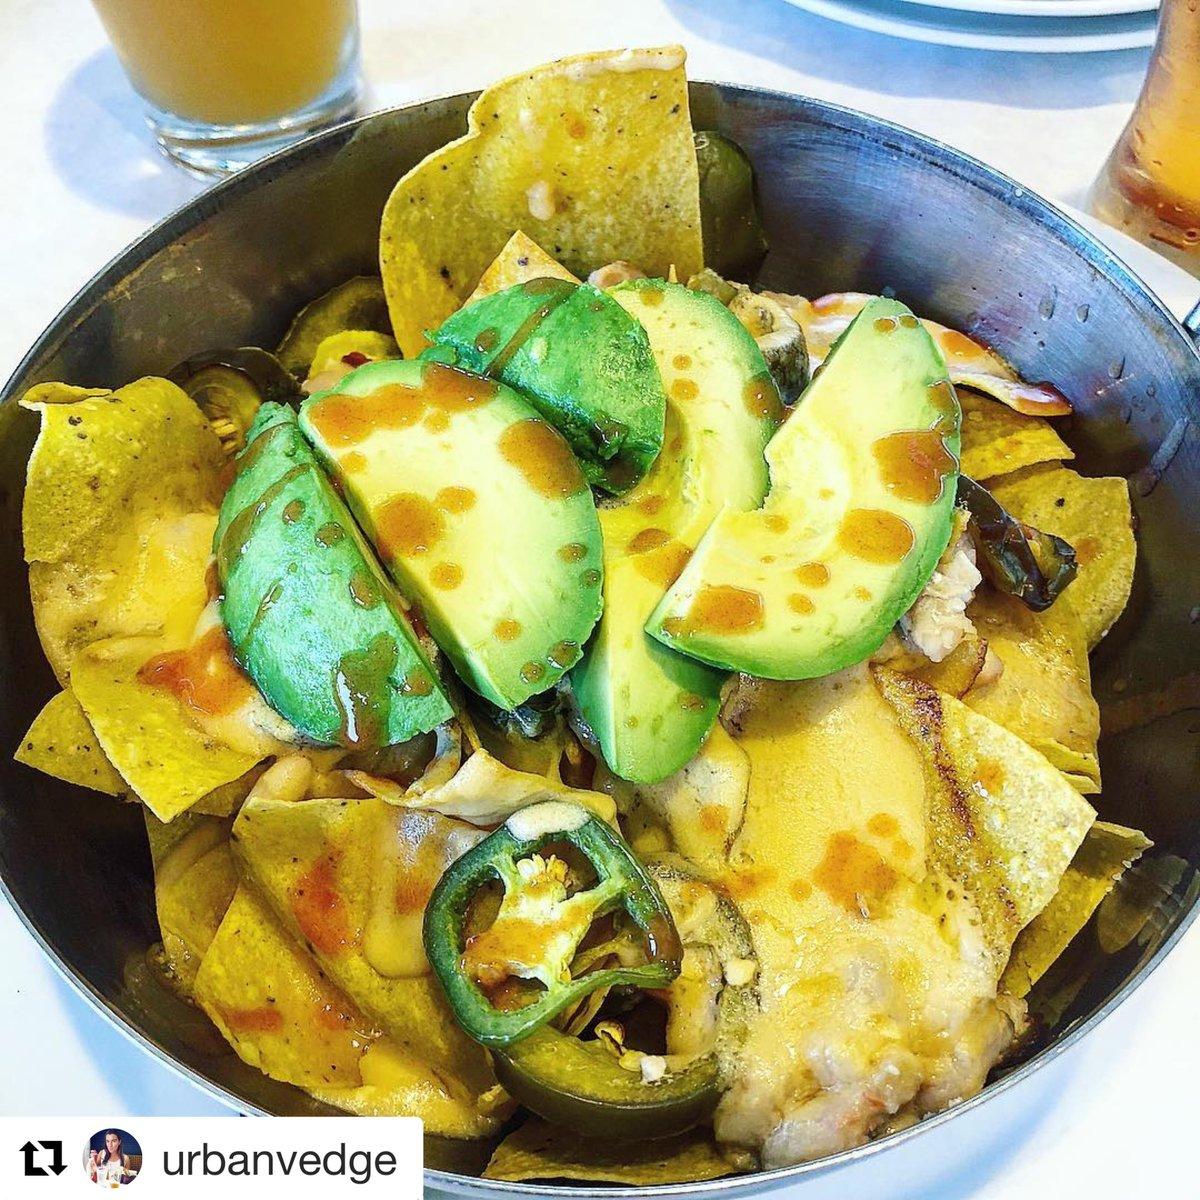 PRO TIP: Our Macho Nachos + hot sauce =  Mexican cuisine paradise. #MACsOnHertel   #Repost @urbanvedge  ・・・ Couldn't resist putting @franksredhot all over these nachos at MAC's! #BuffaloMunchies #BuffaloVeg ##BuffaloFoodie #BuffaloEatspic.twitter.com/oBFFAqrr9i